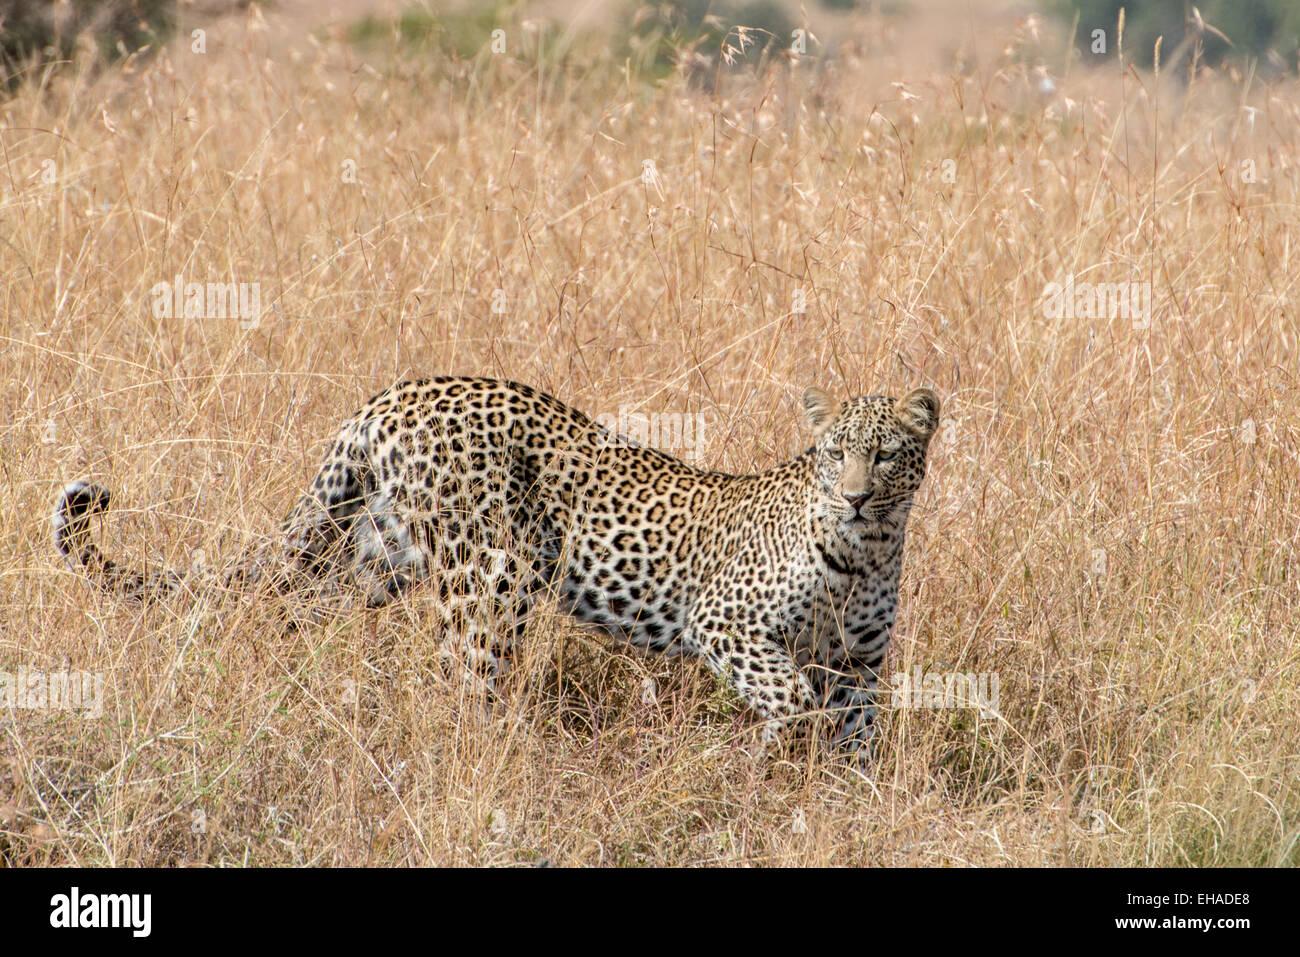 Serengeti NP, Leopard - Stock Image